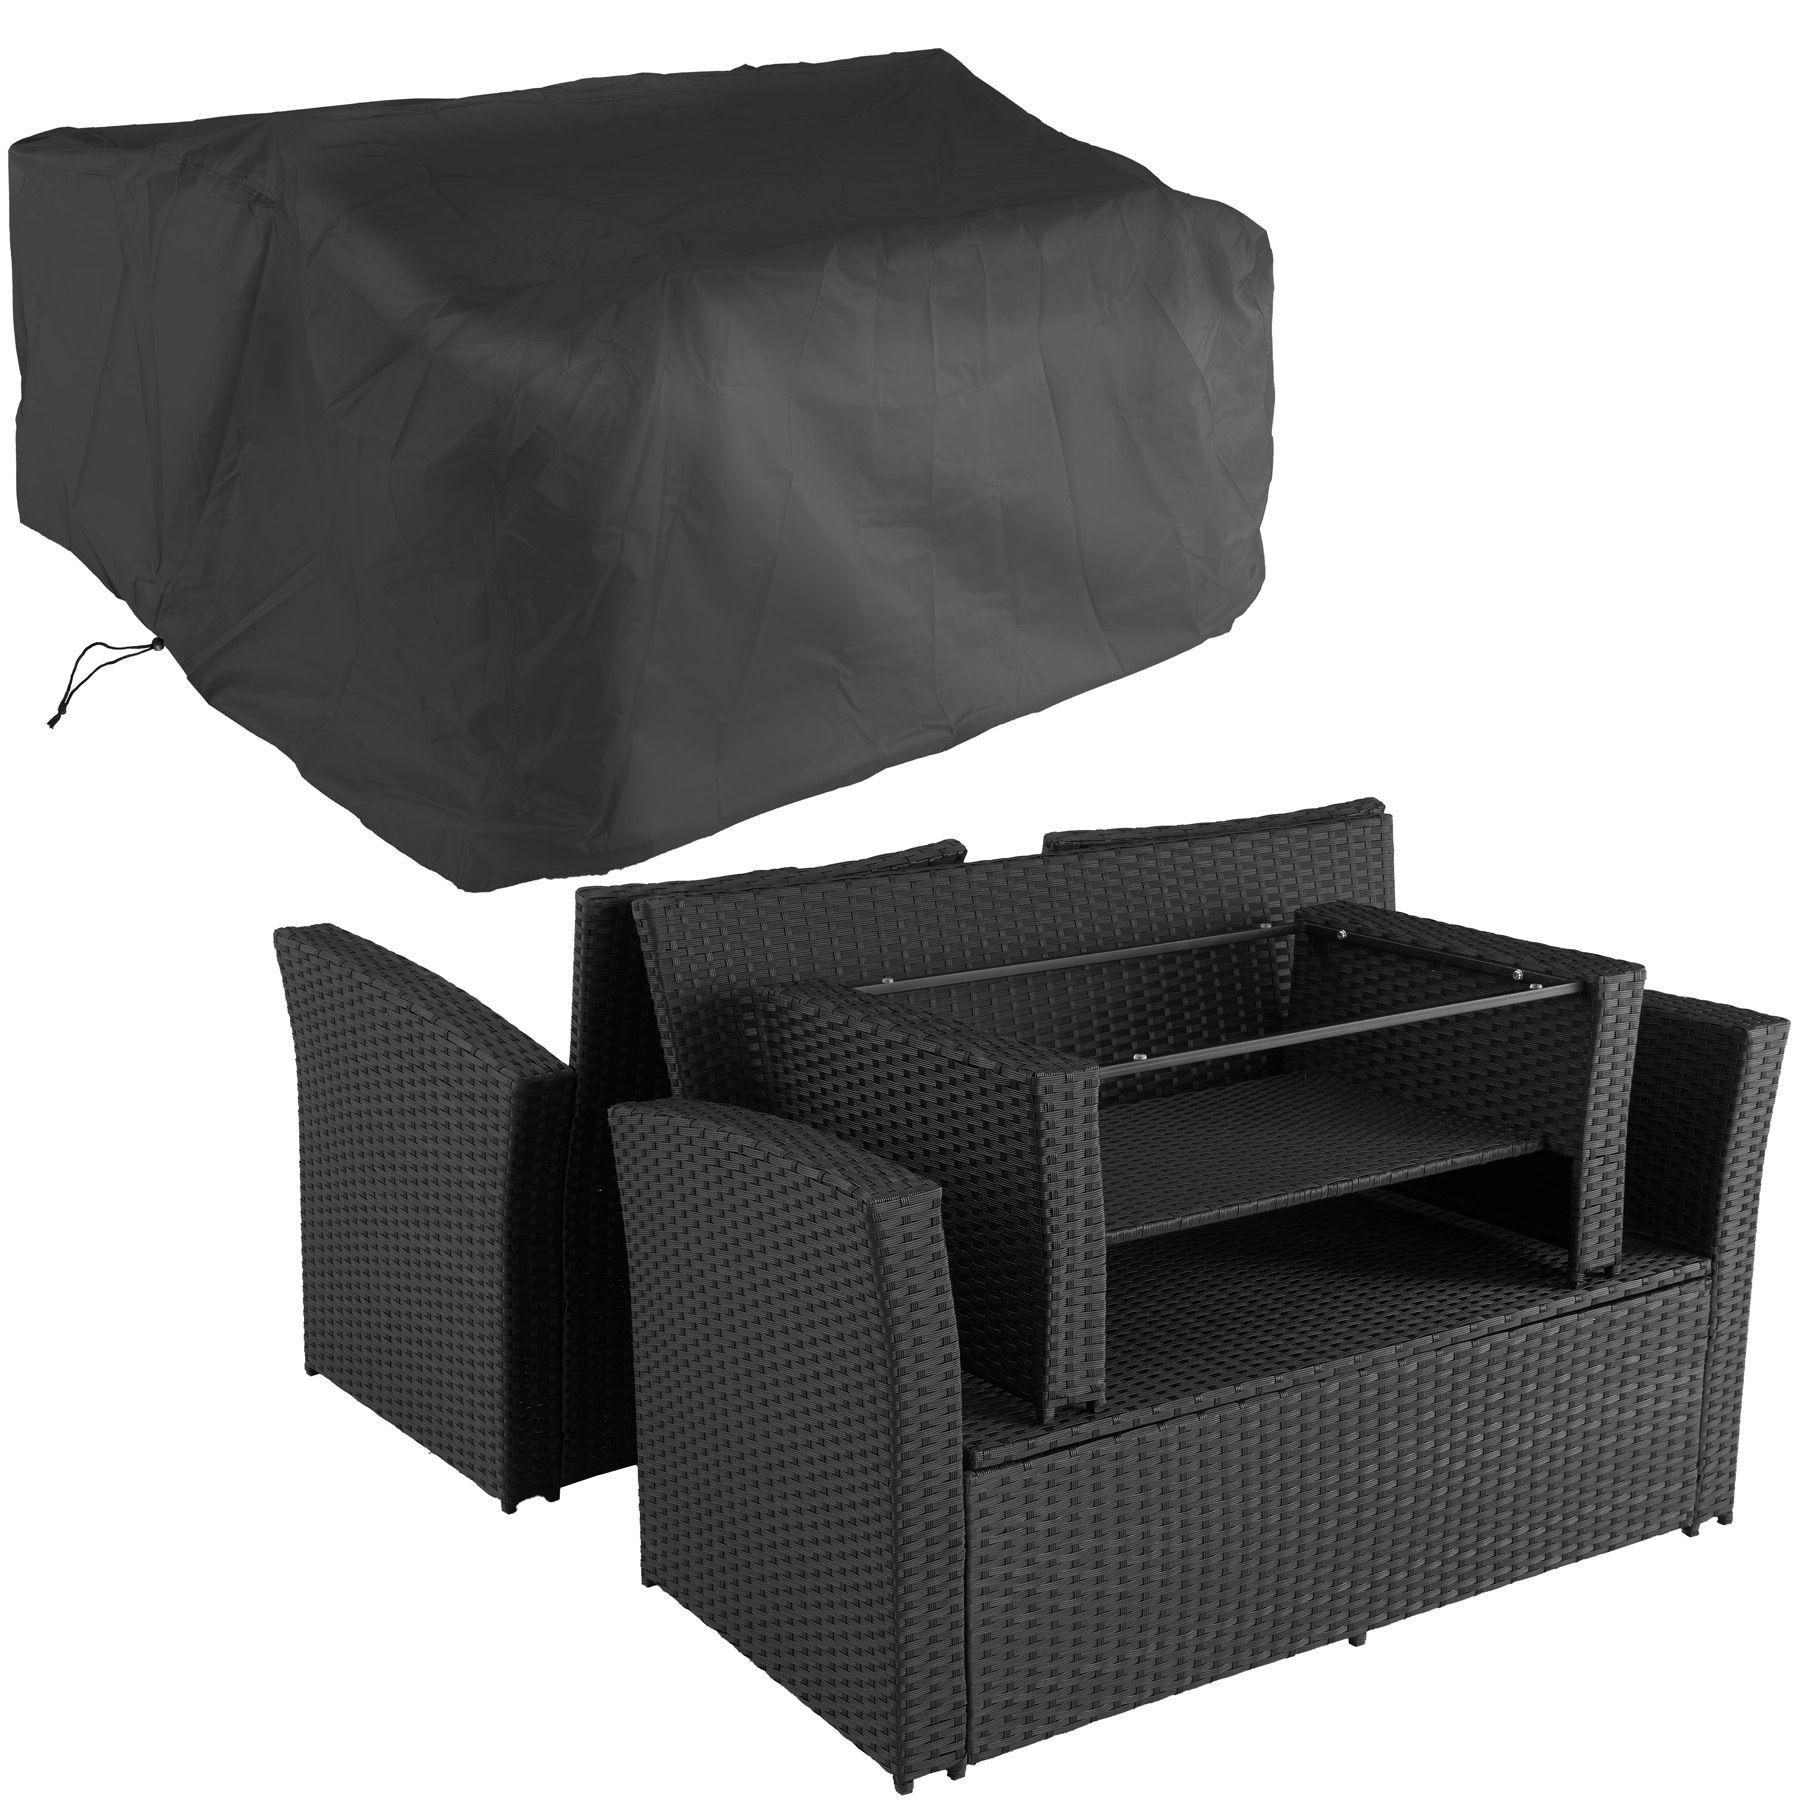 Rattan Seating Lounge Set Sofa Seats Stools Table Garden ...